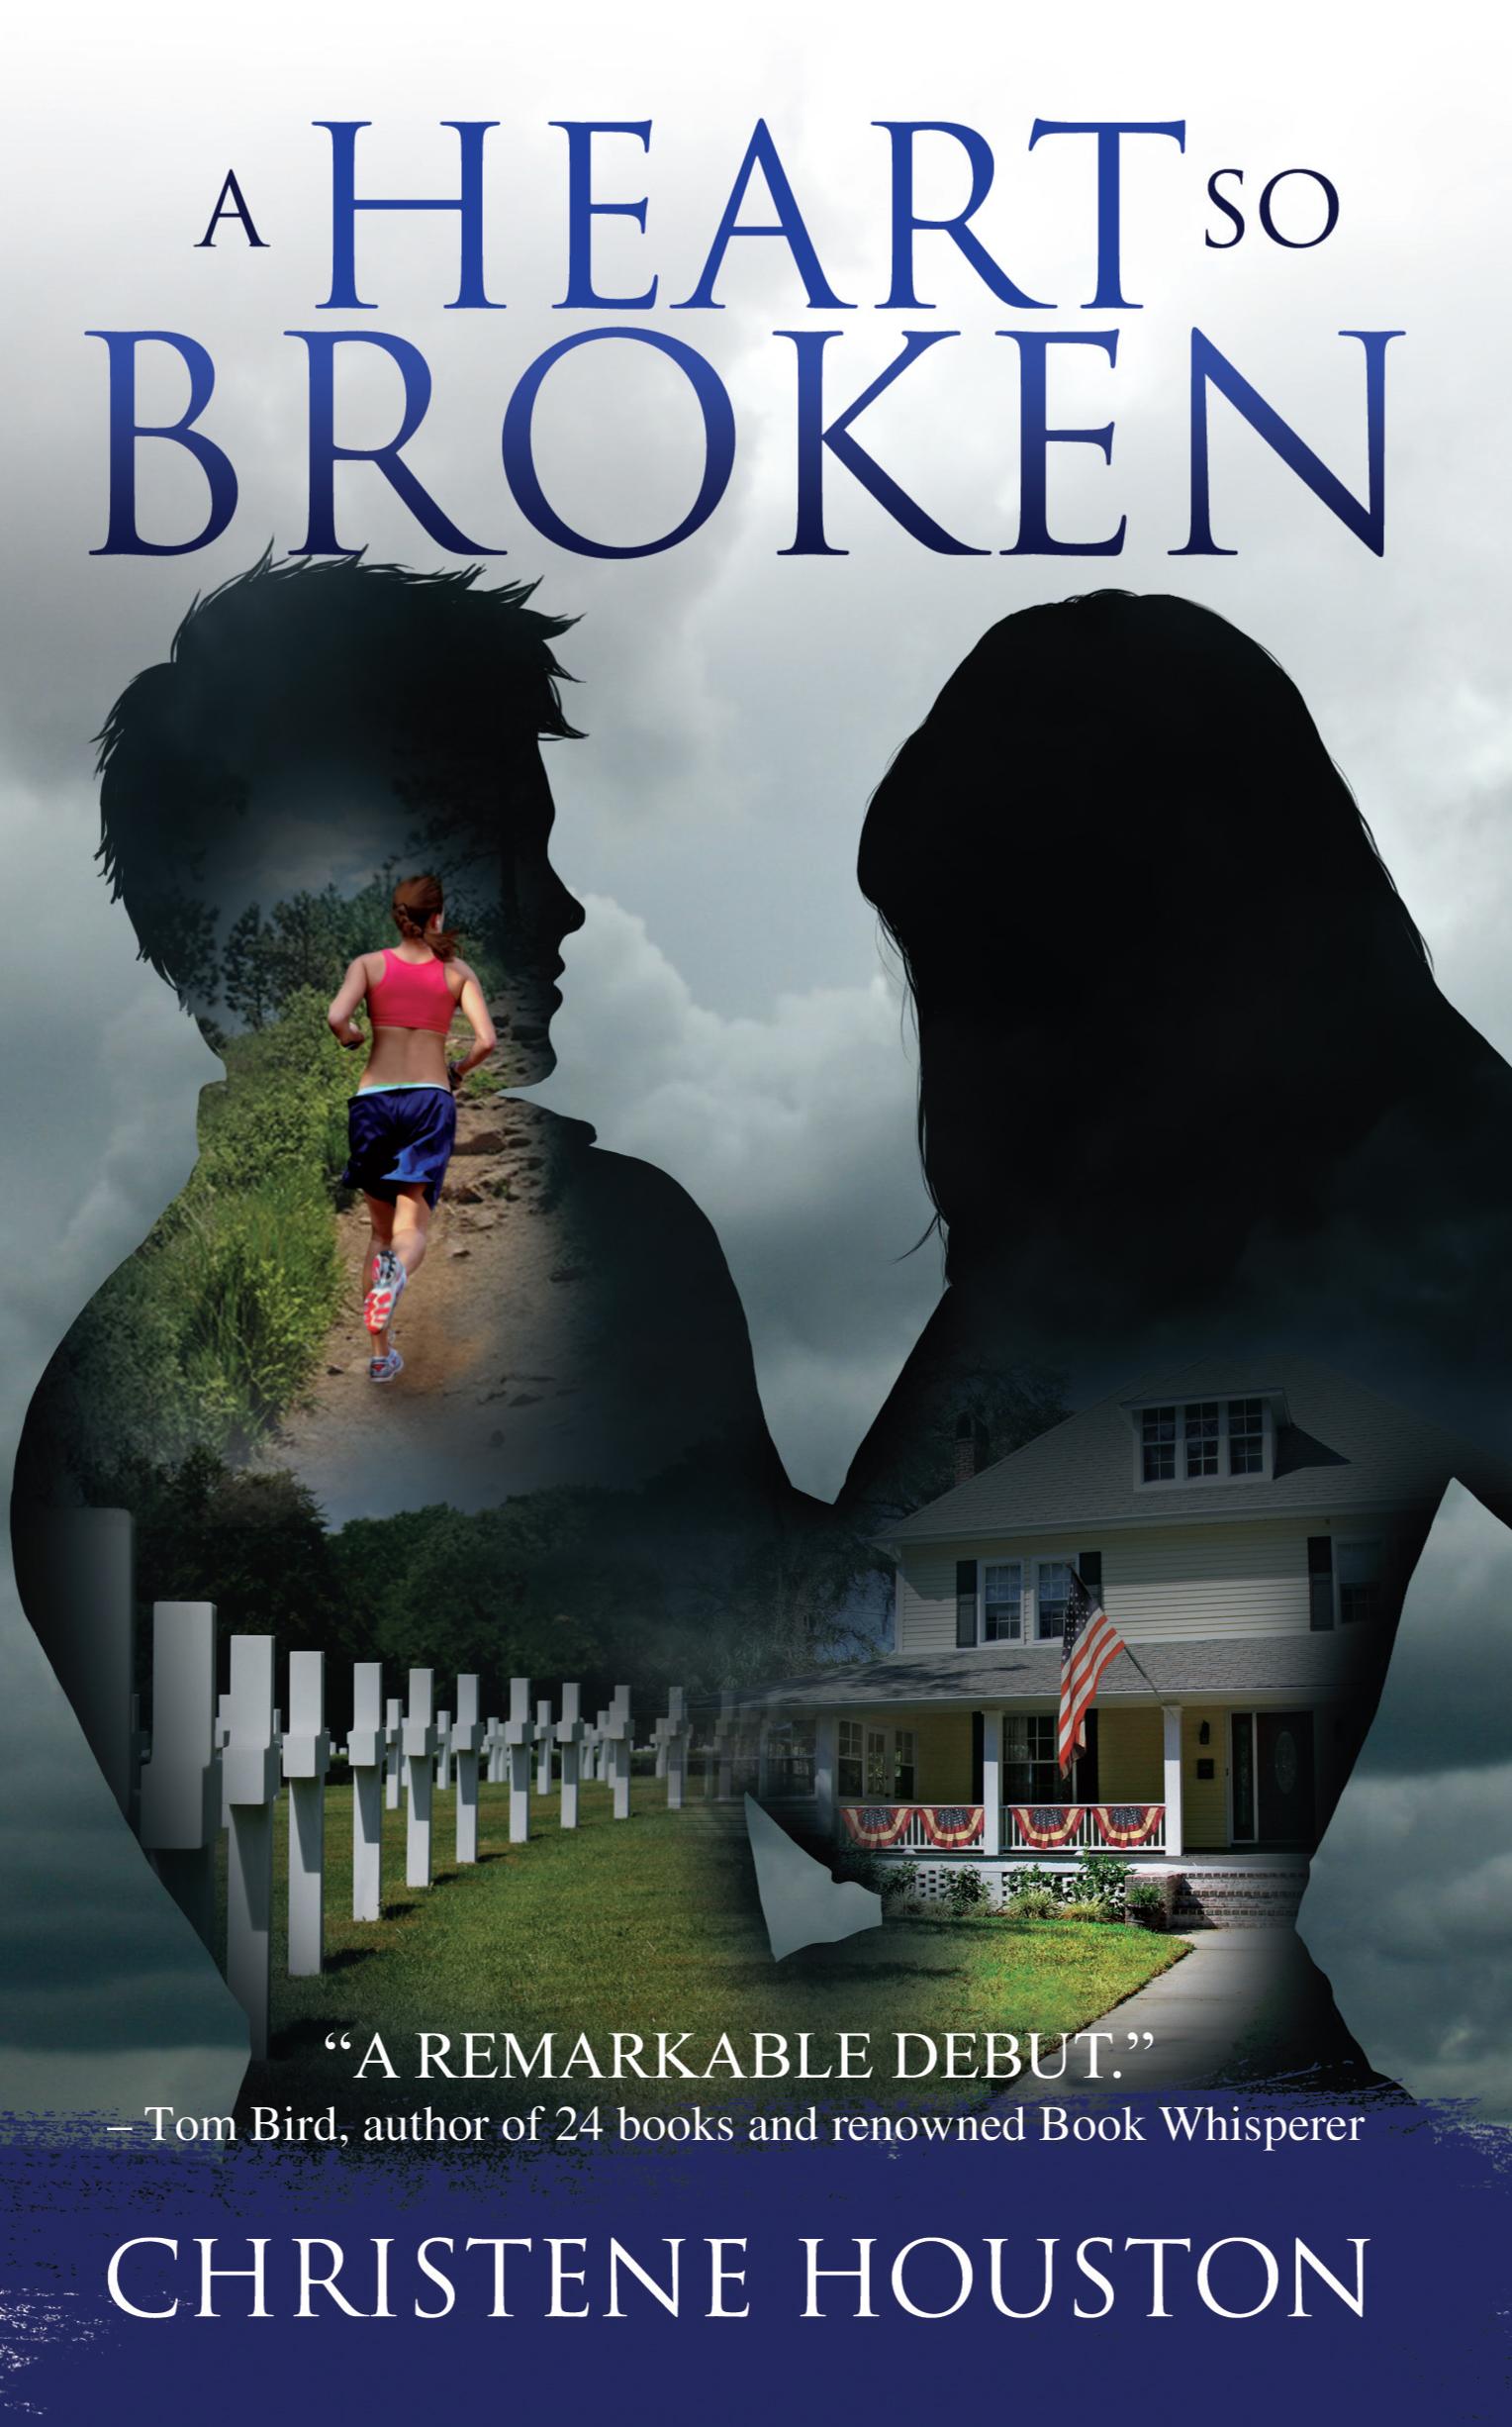 A Heart So Broken by Christene Houston // GIVEAWAY